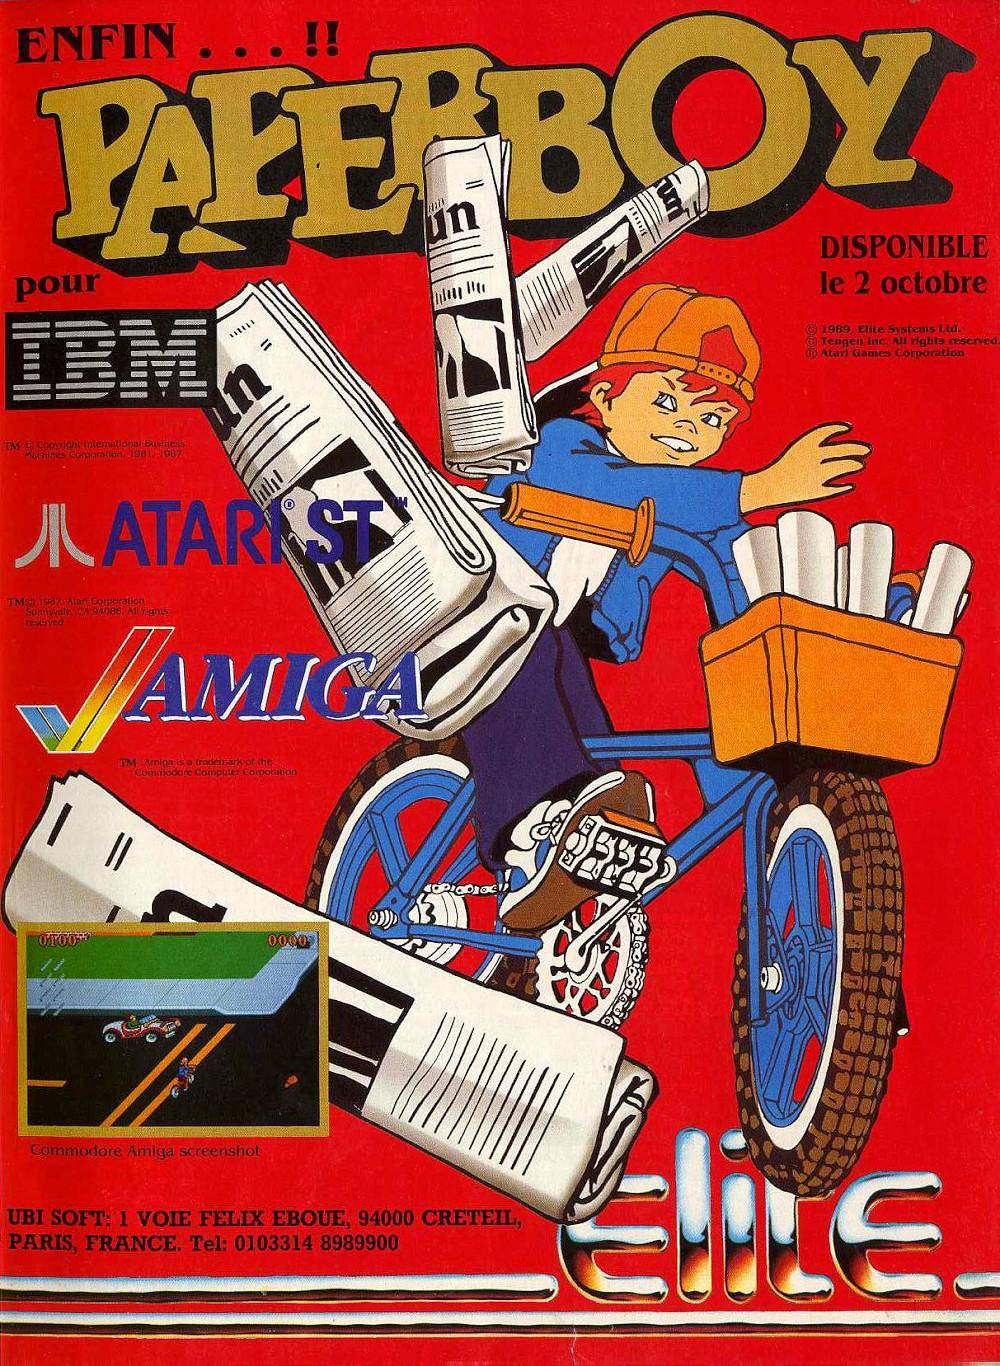 Paperboy Atari ad